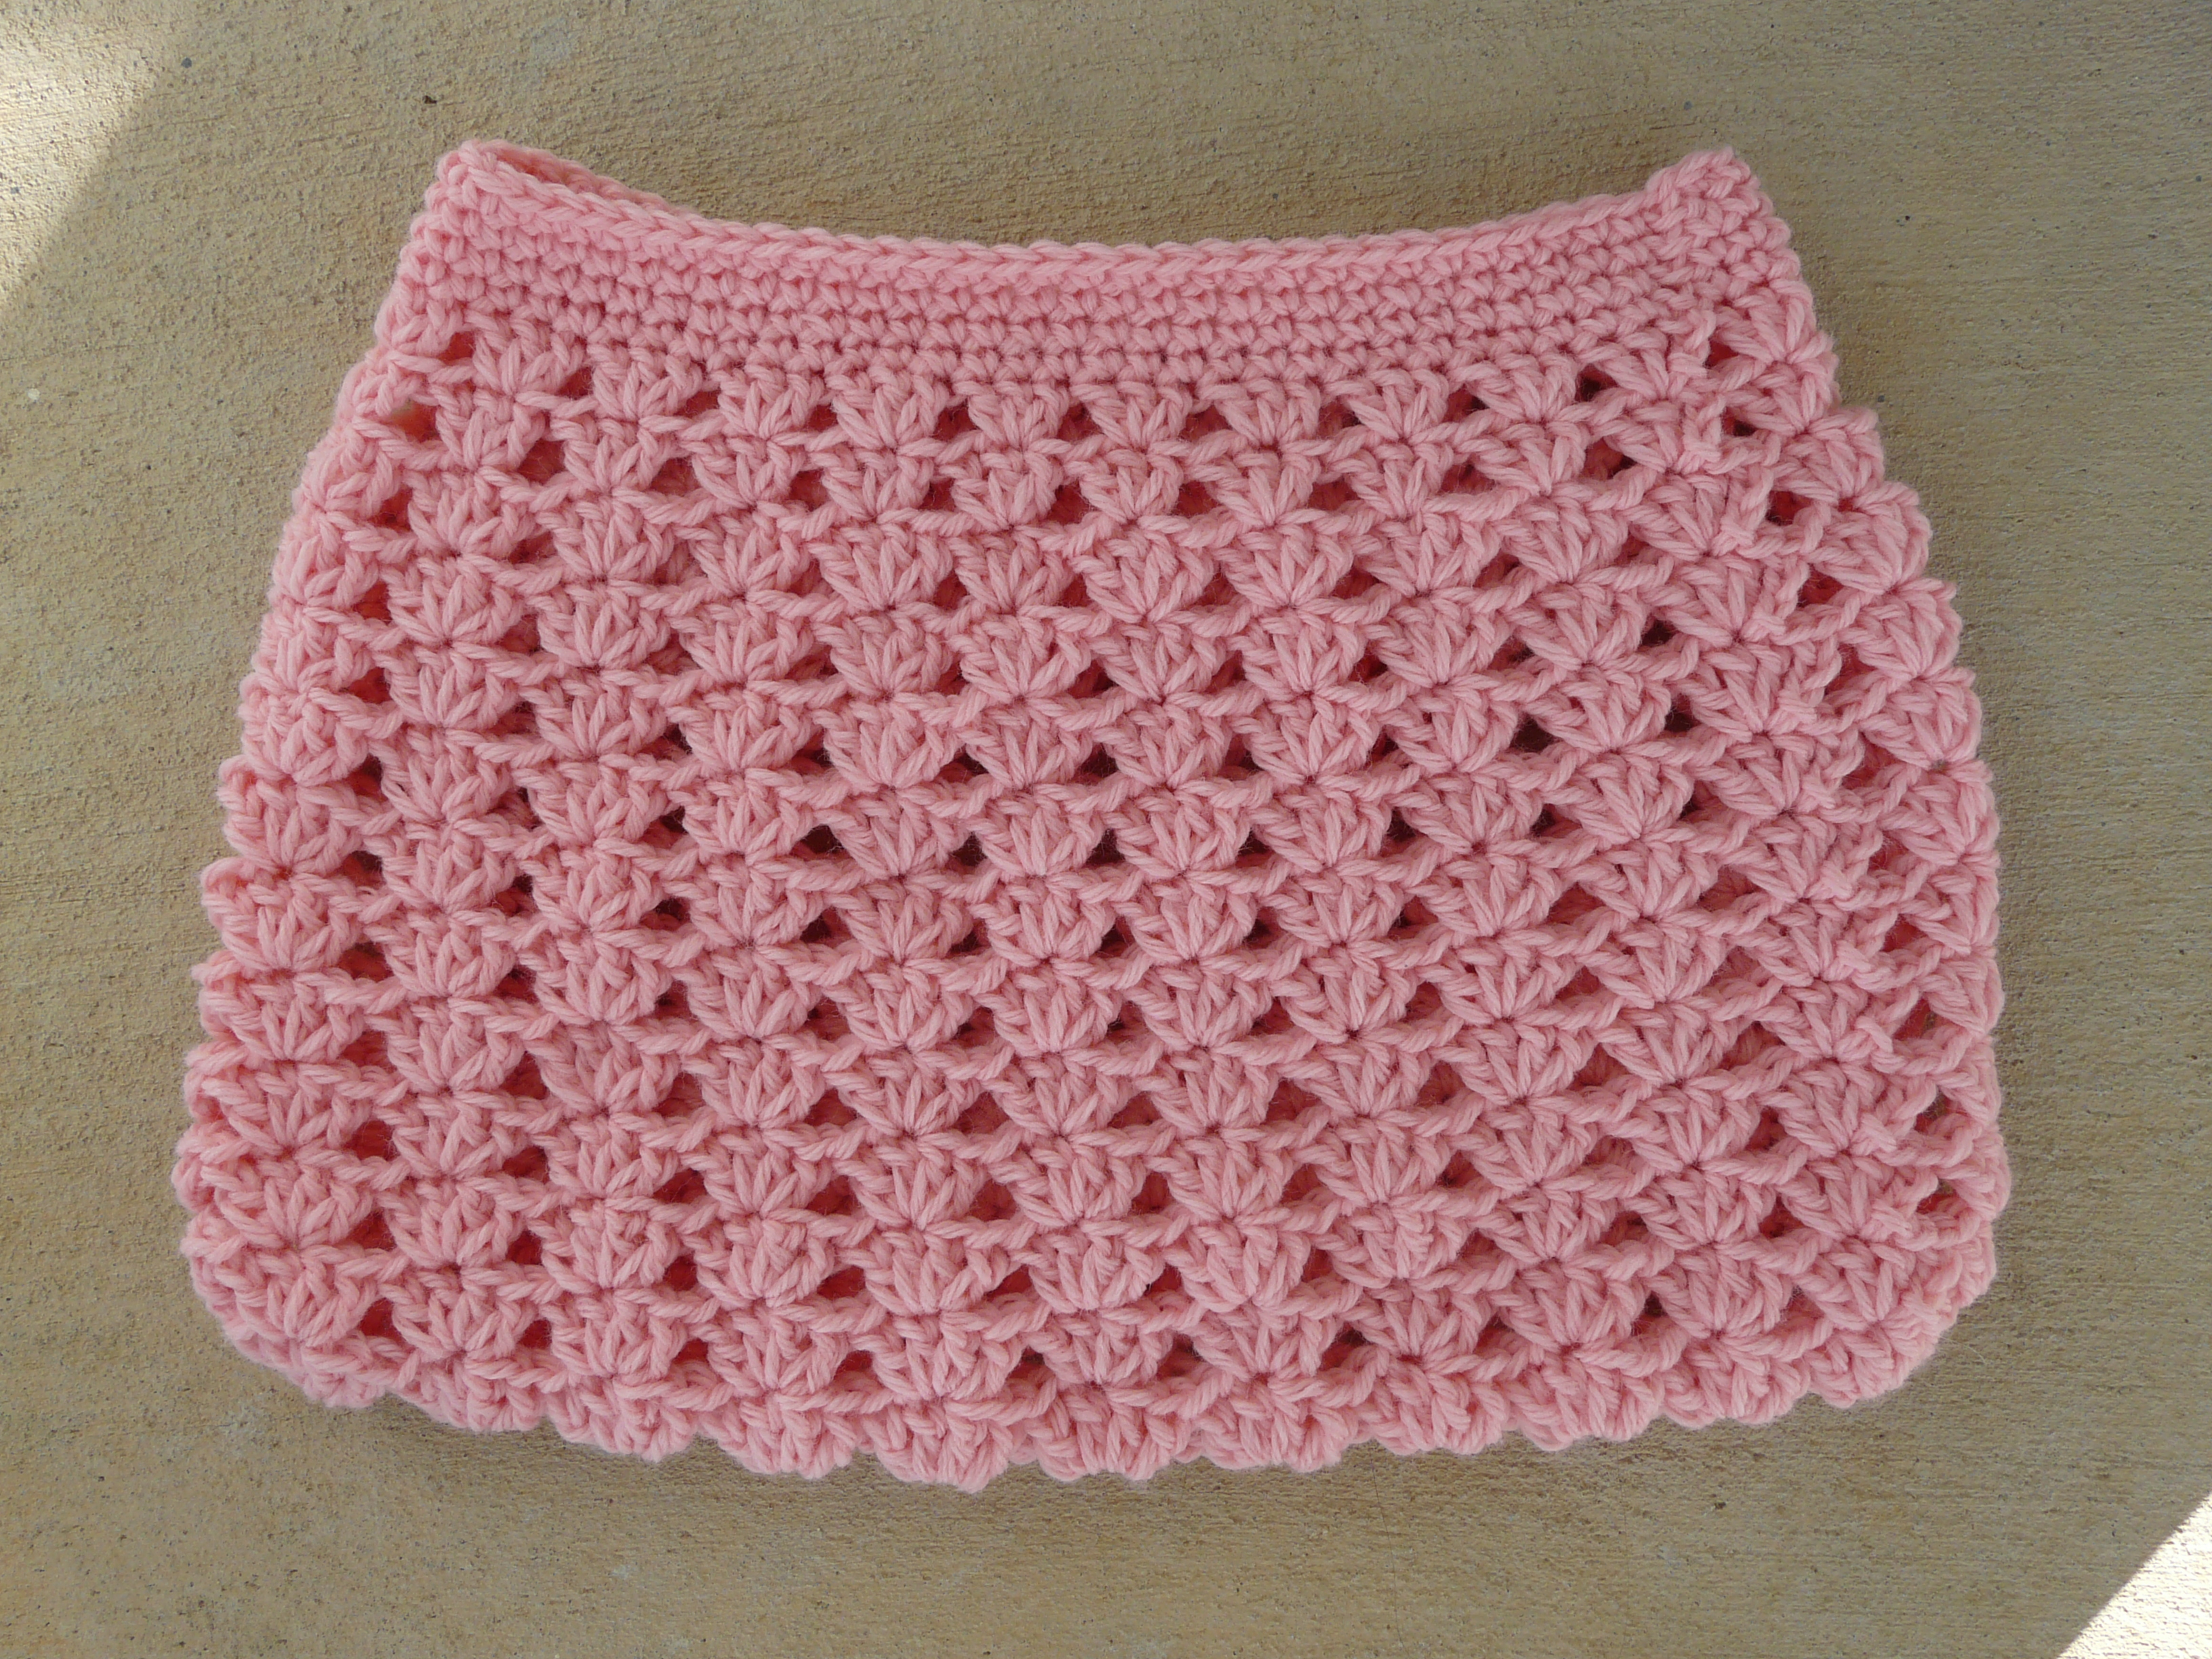 Crochet Granny Square Hobo Bag Pattern : The body of my crochet hobo bag-to-be - Crochetbug